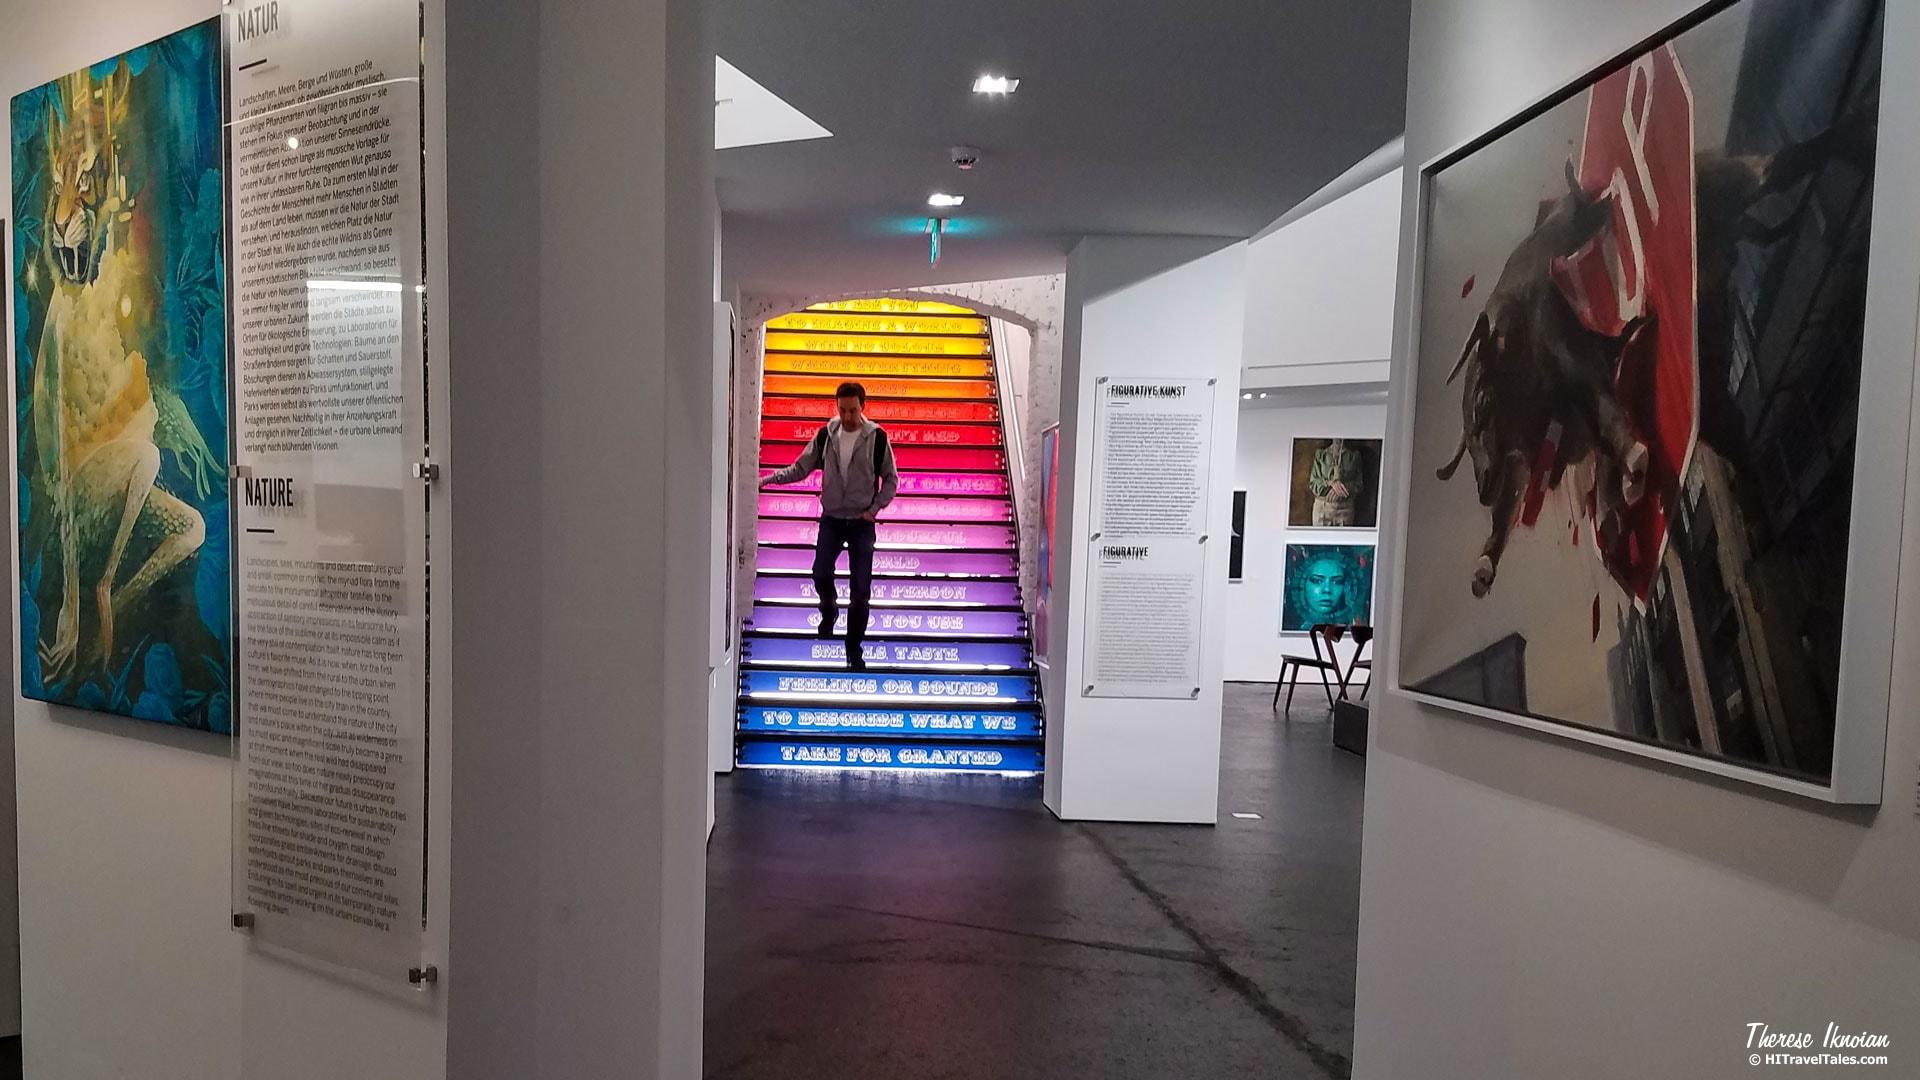 Urban Nation museum showcases street art in Berlin